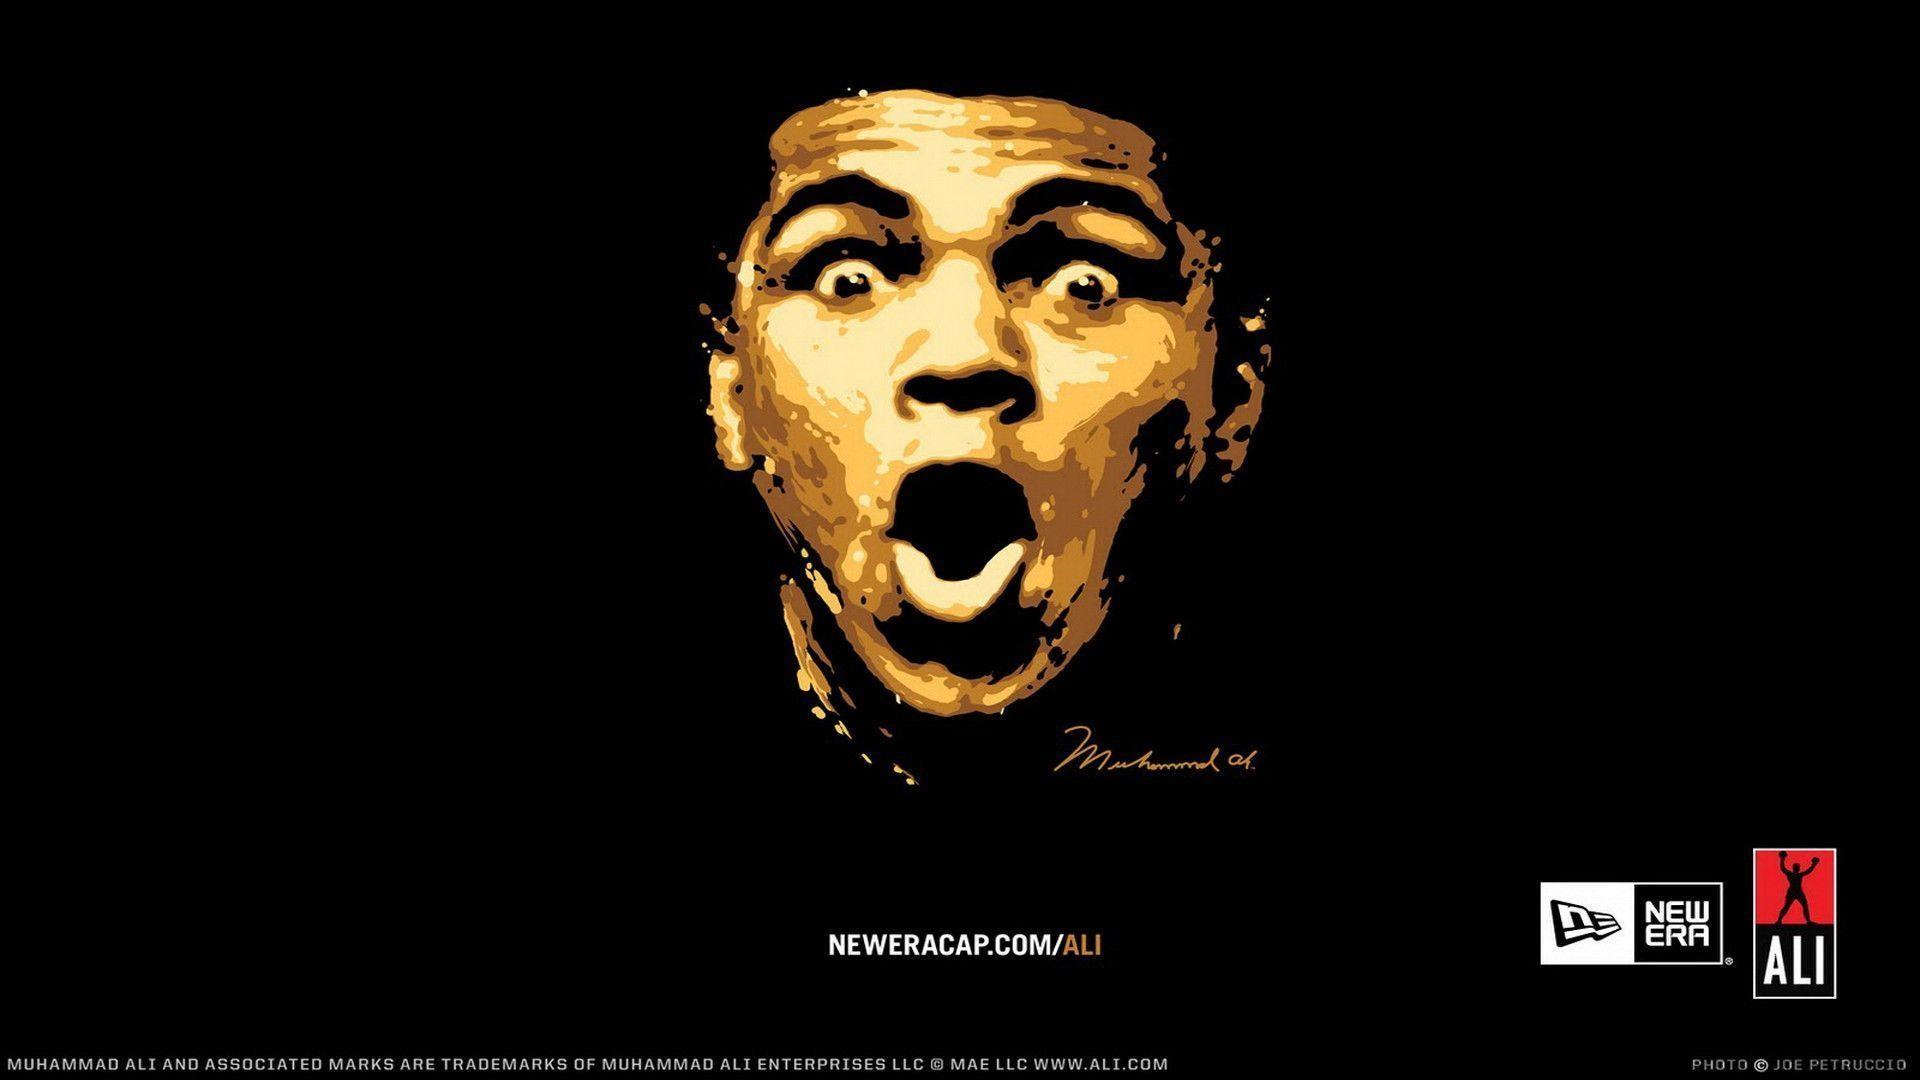 Images For > Muhammad Ali Wallpaper Hd